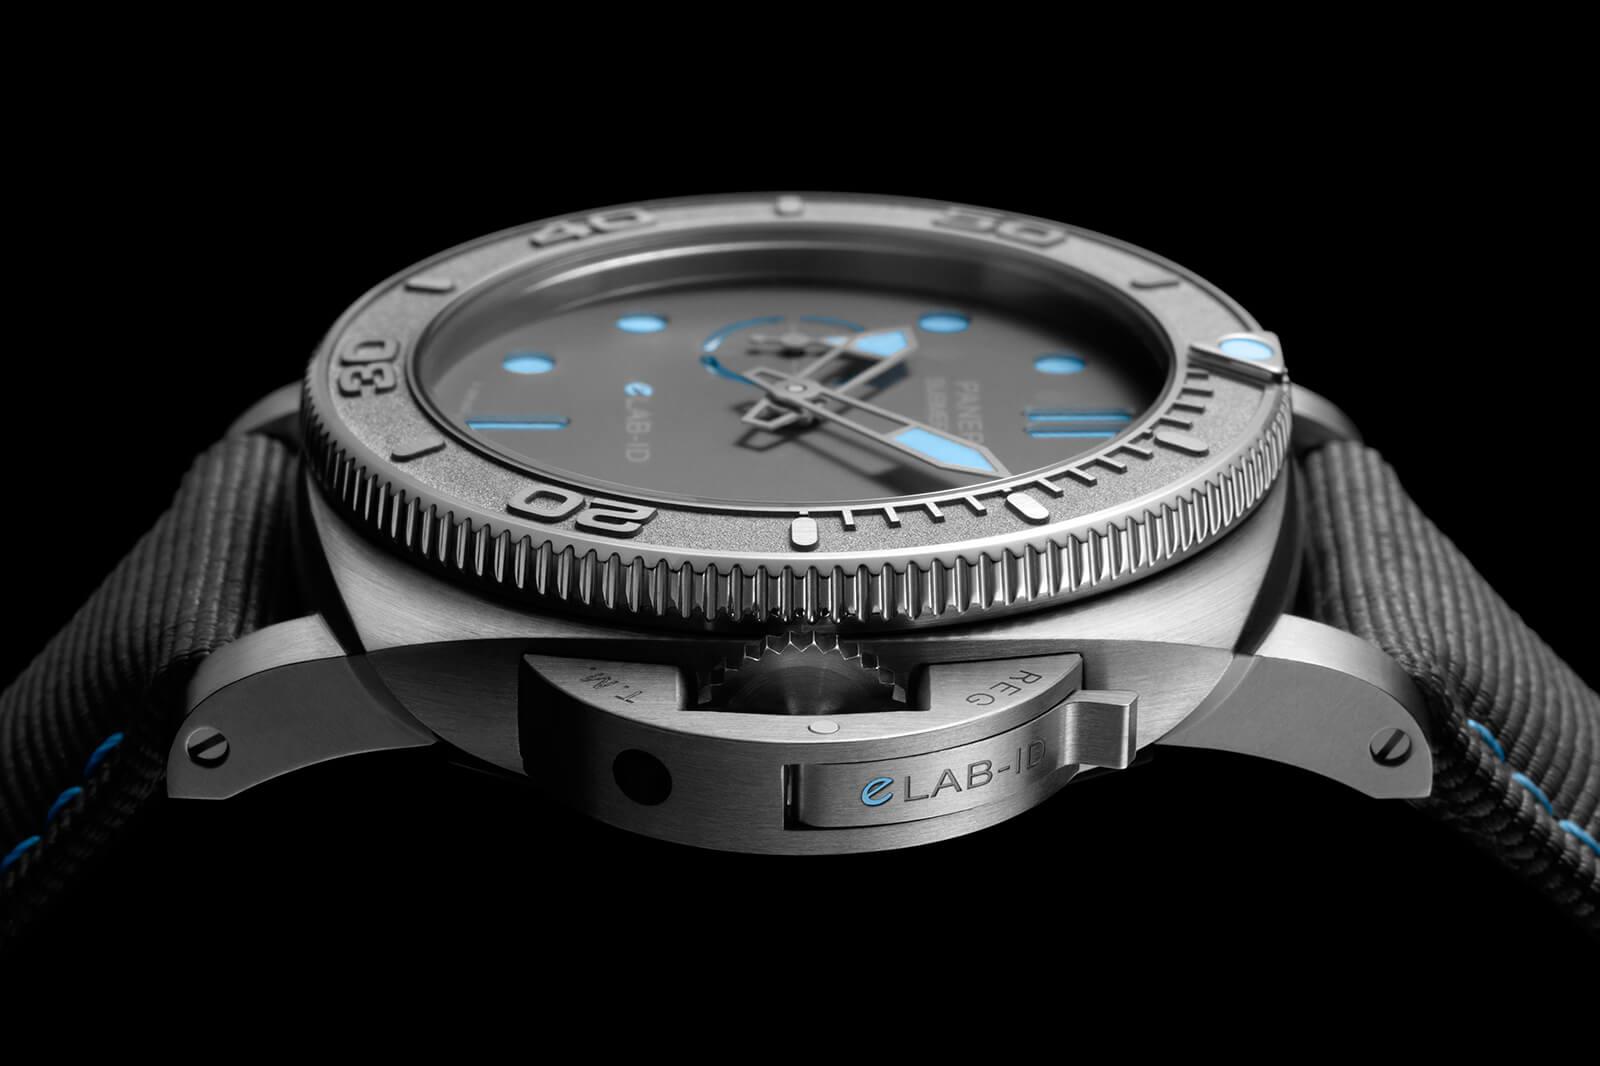 Panerai Submersible eLAB-ID™